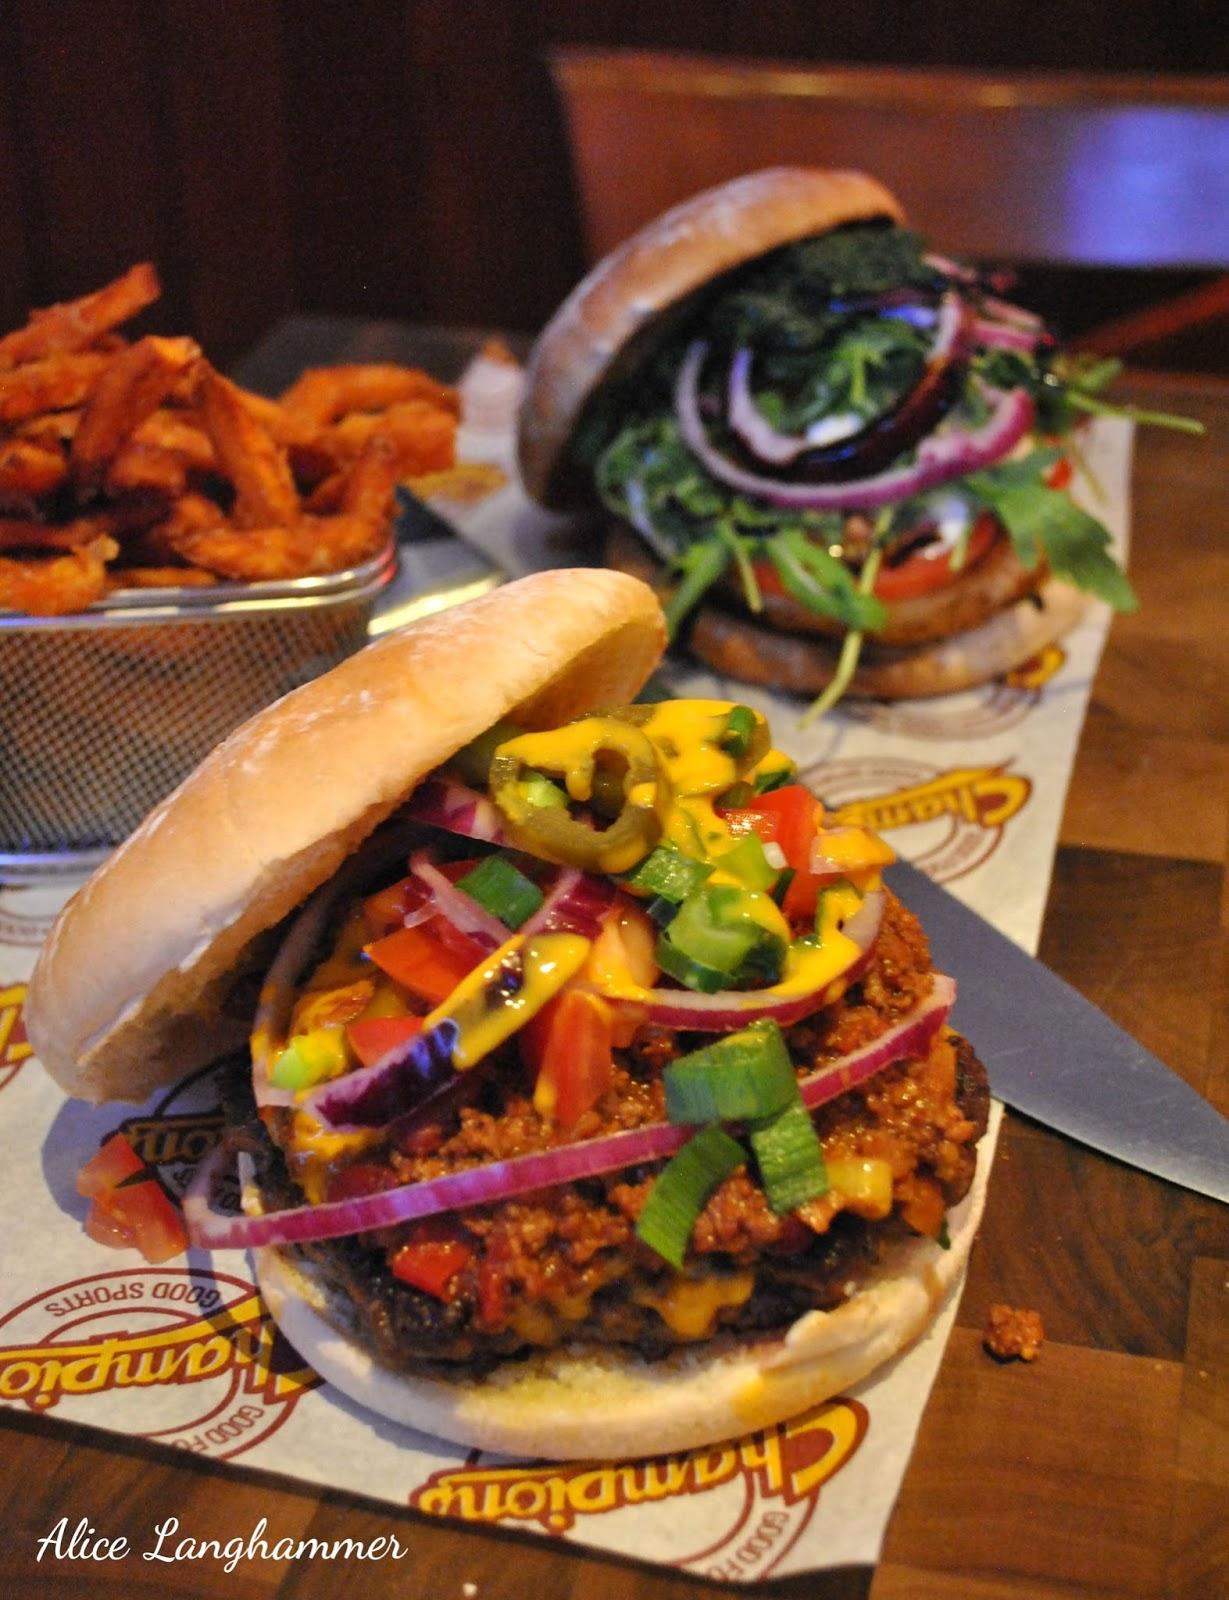 Best Burger in Town